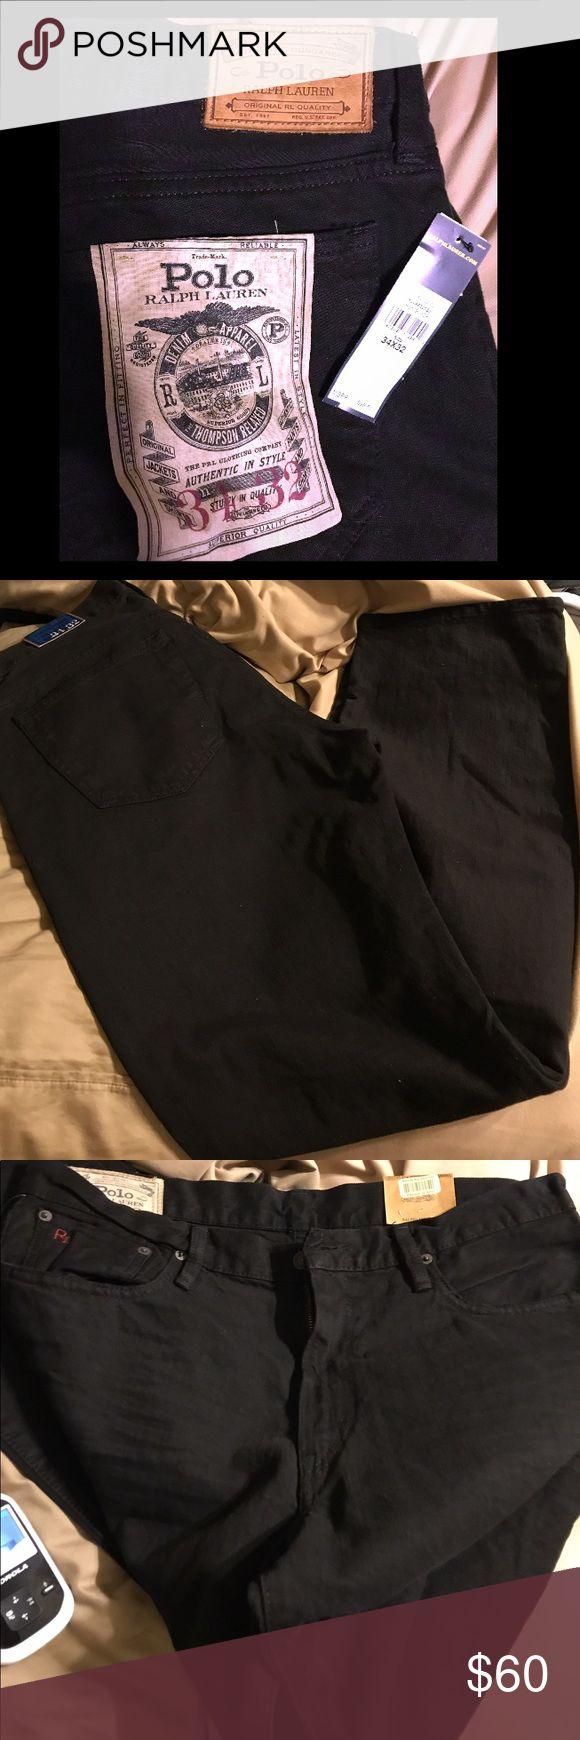 BNWT Men's Ralph Lauren Jeans Black BNWT Polo by Ralph Lauren Thompson relaxed fit 34x32 Polo by Ralph Lauren Jeans